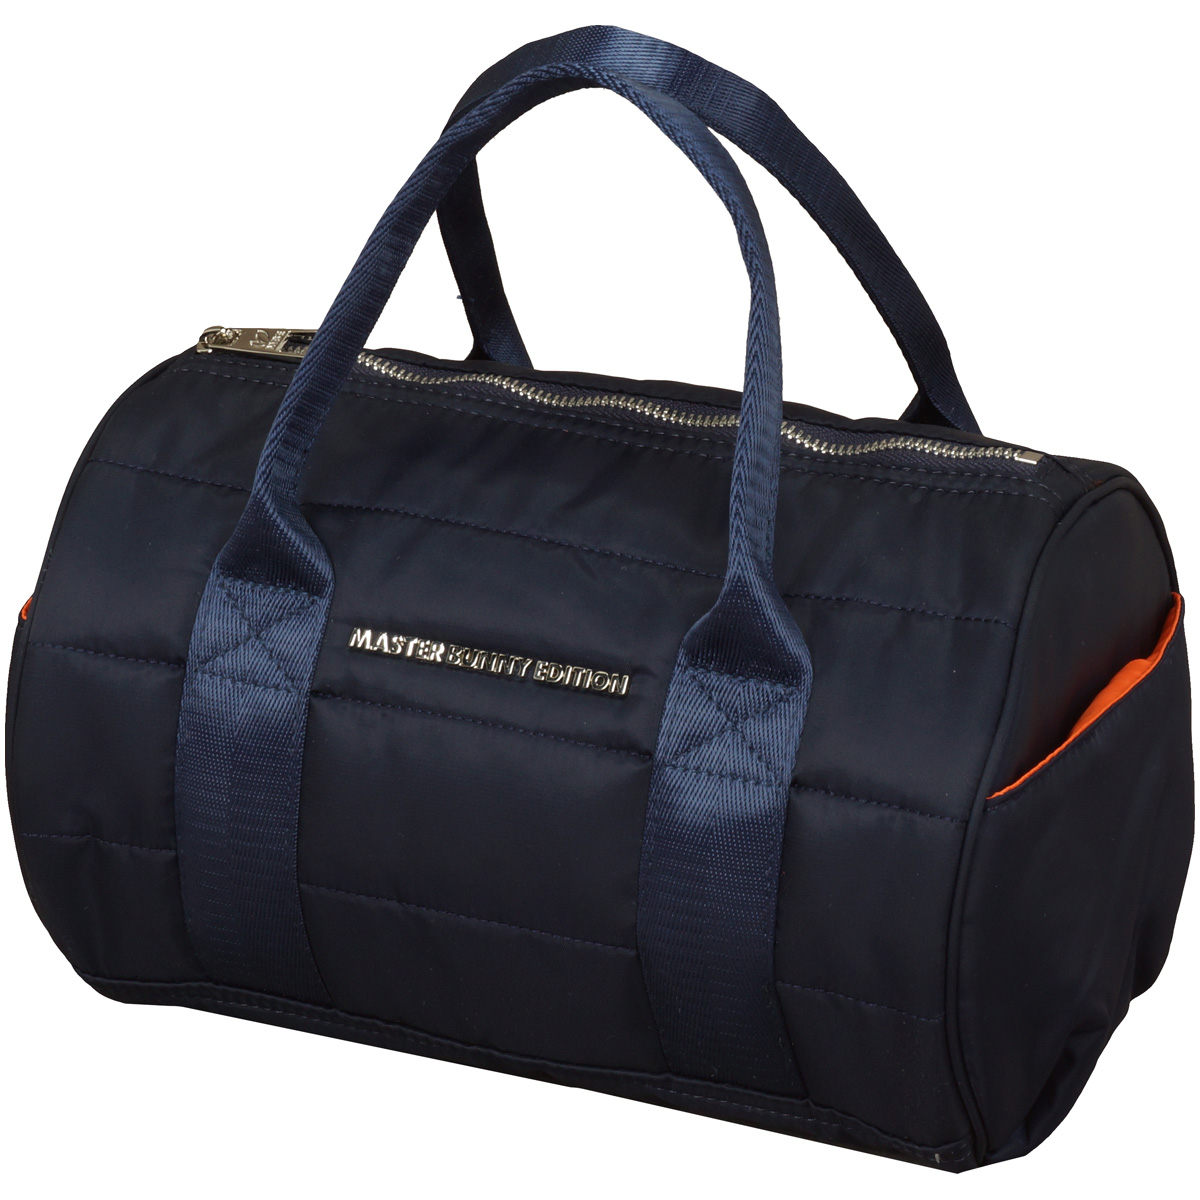 MA1カートバッグ